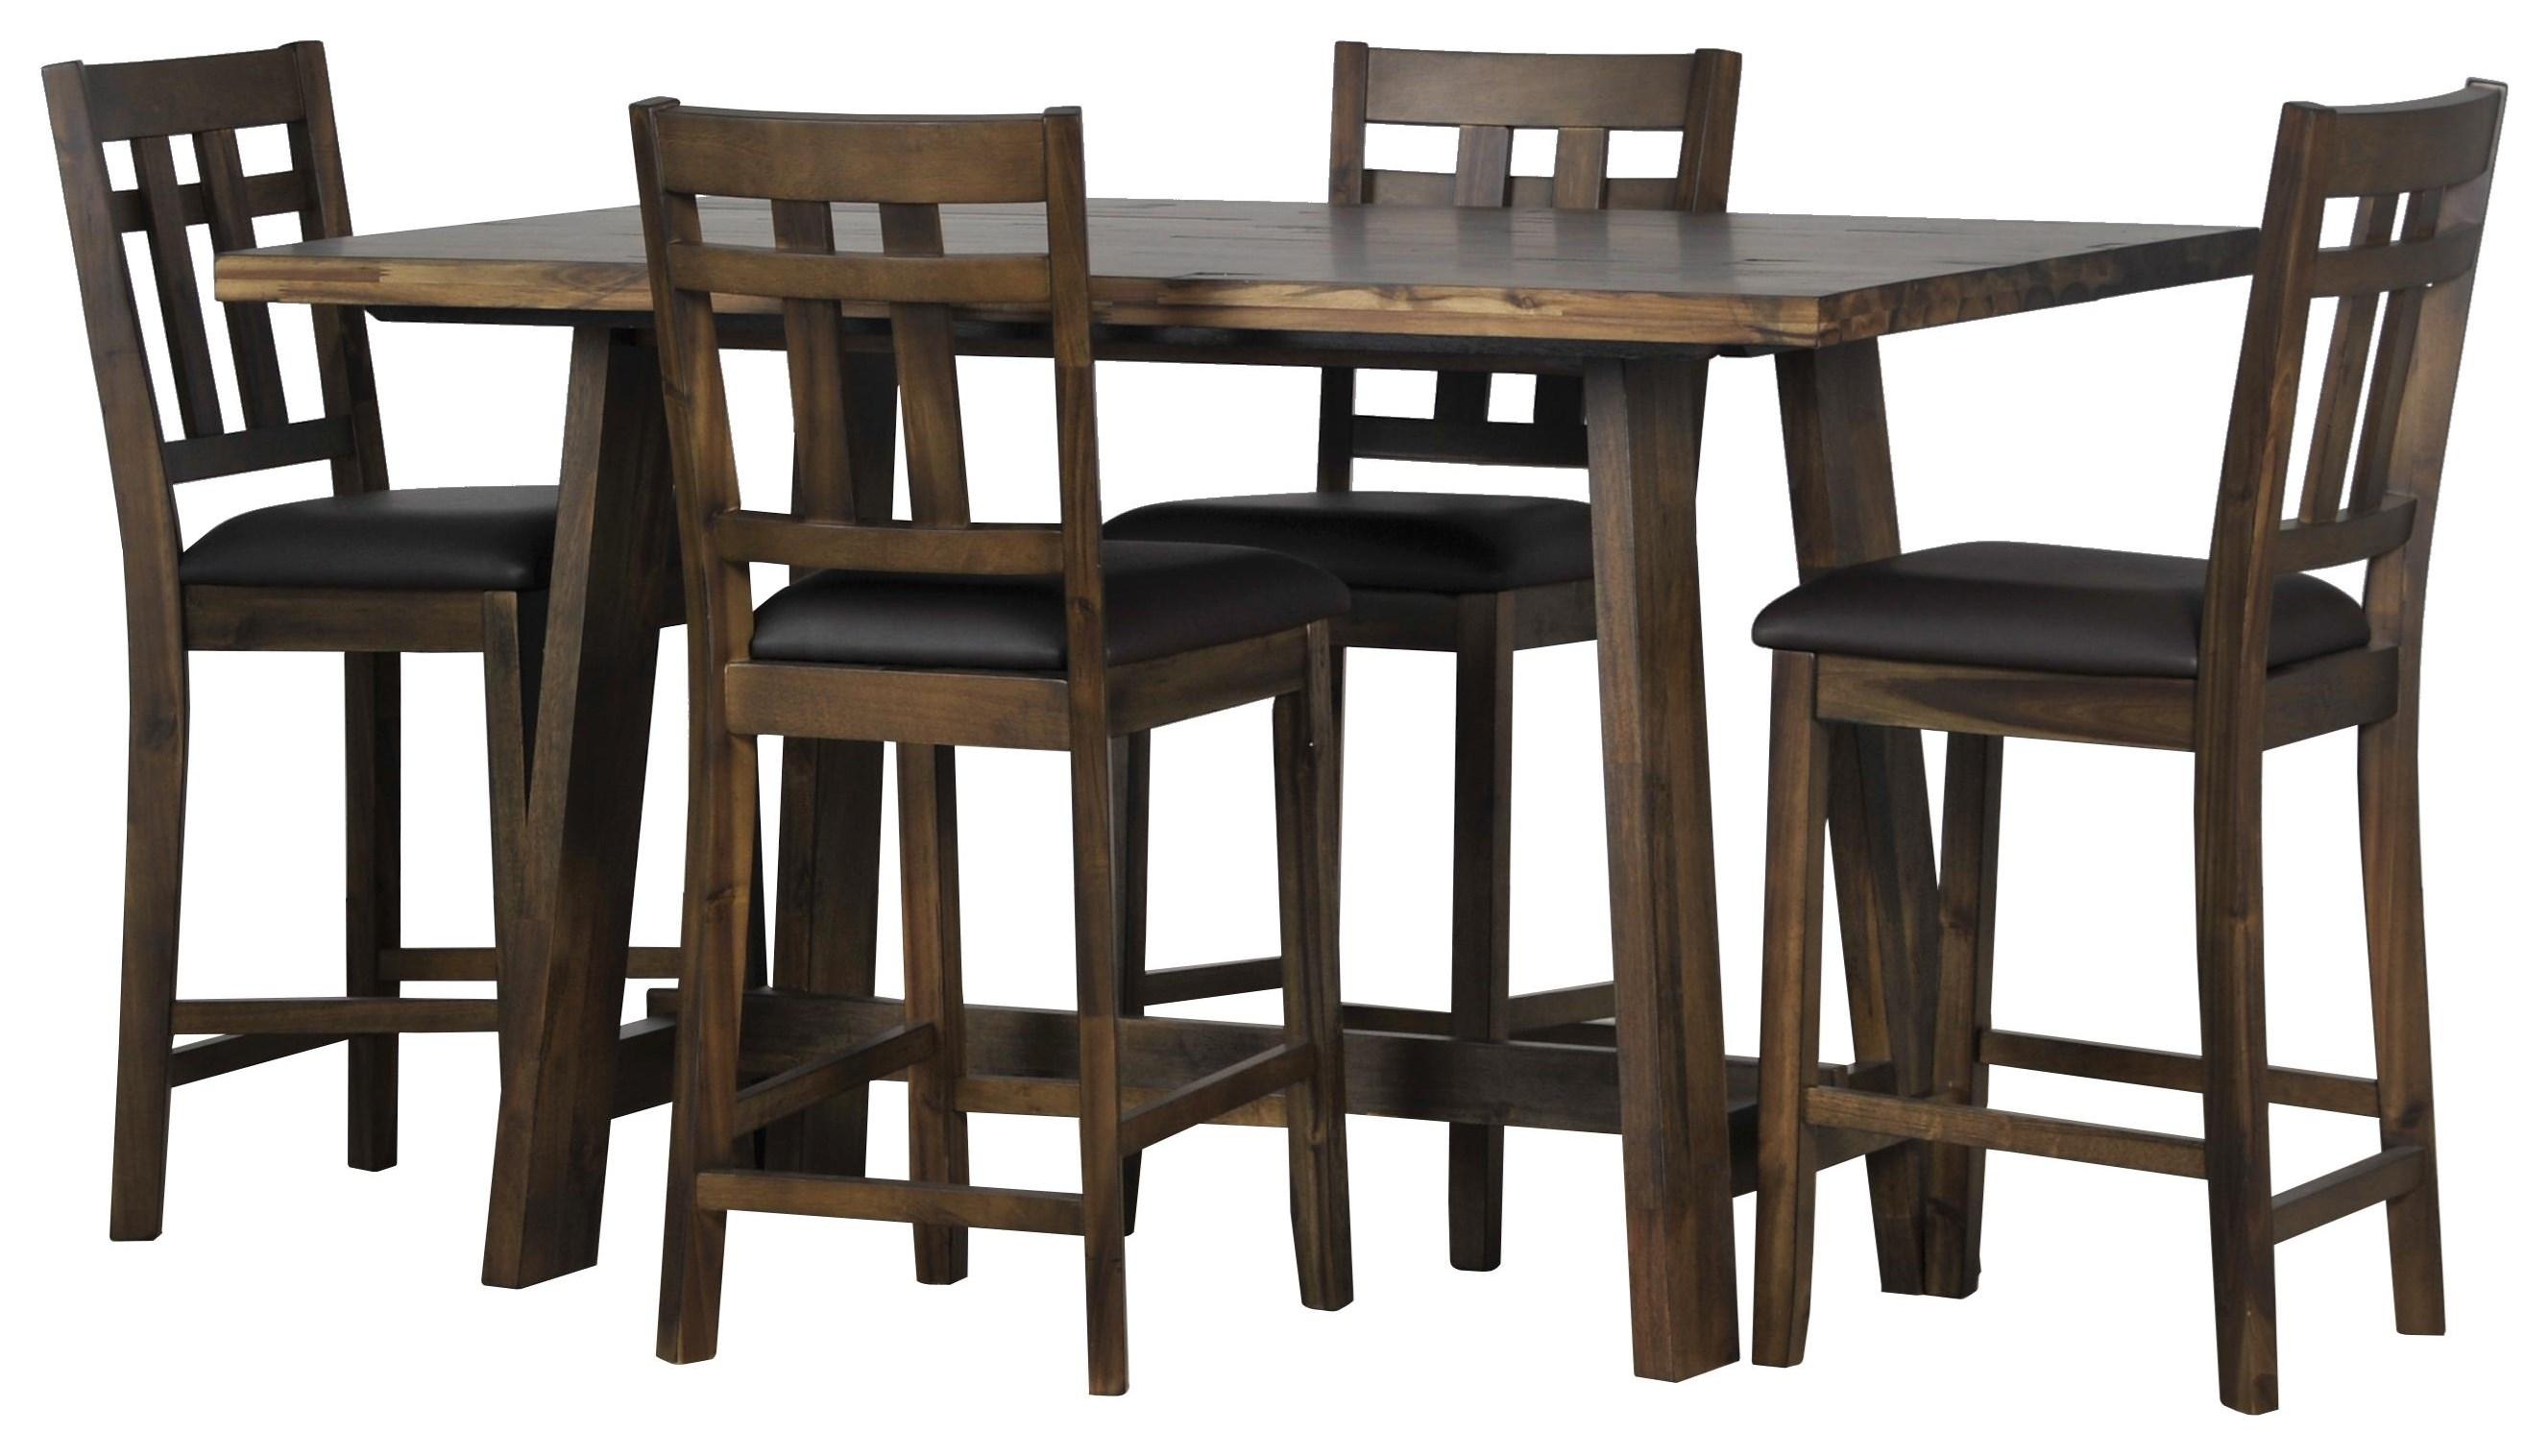 Saranac 5 Piece Dining Set at Sadler's Home Furnishings